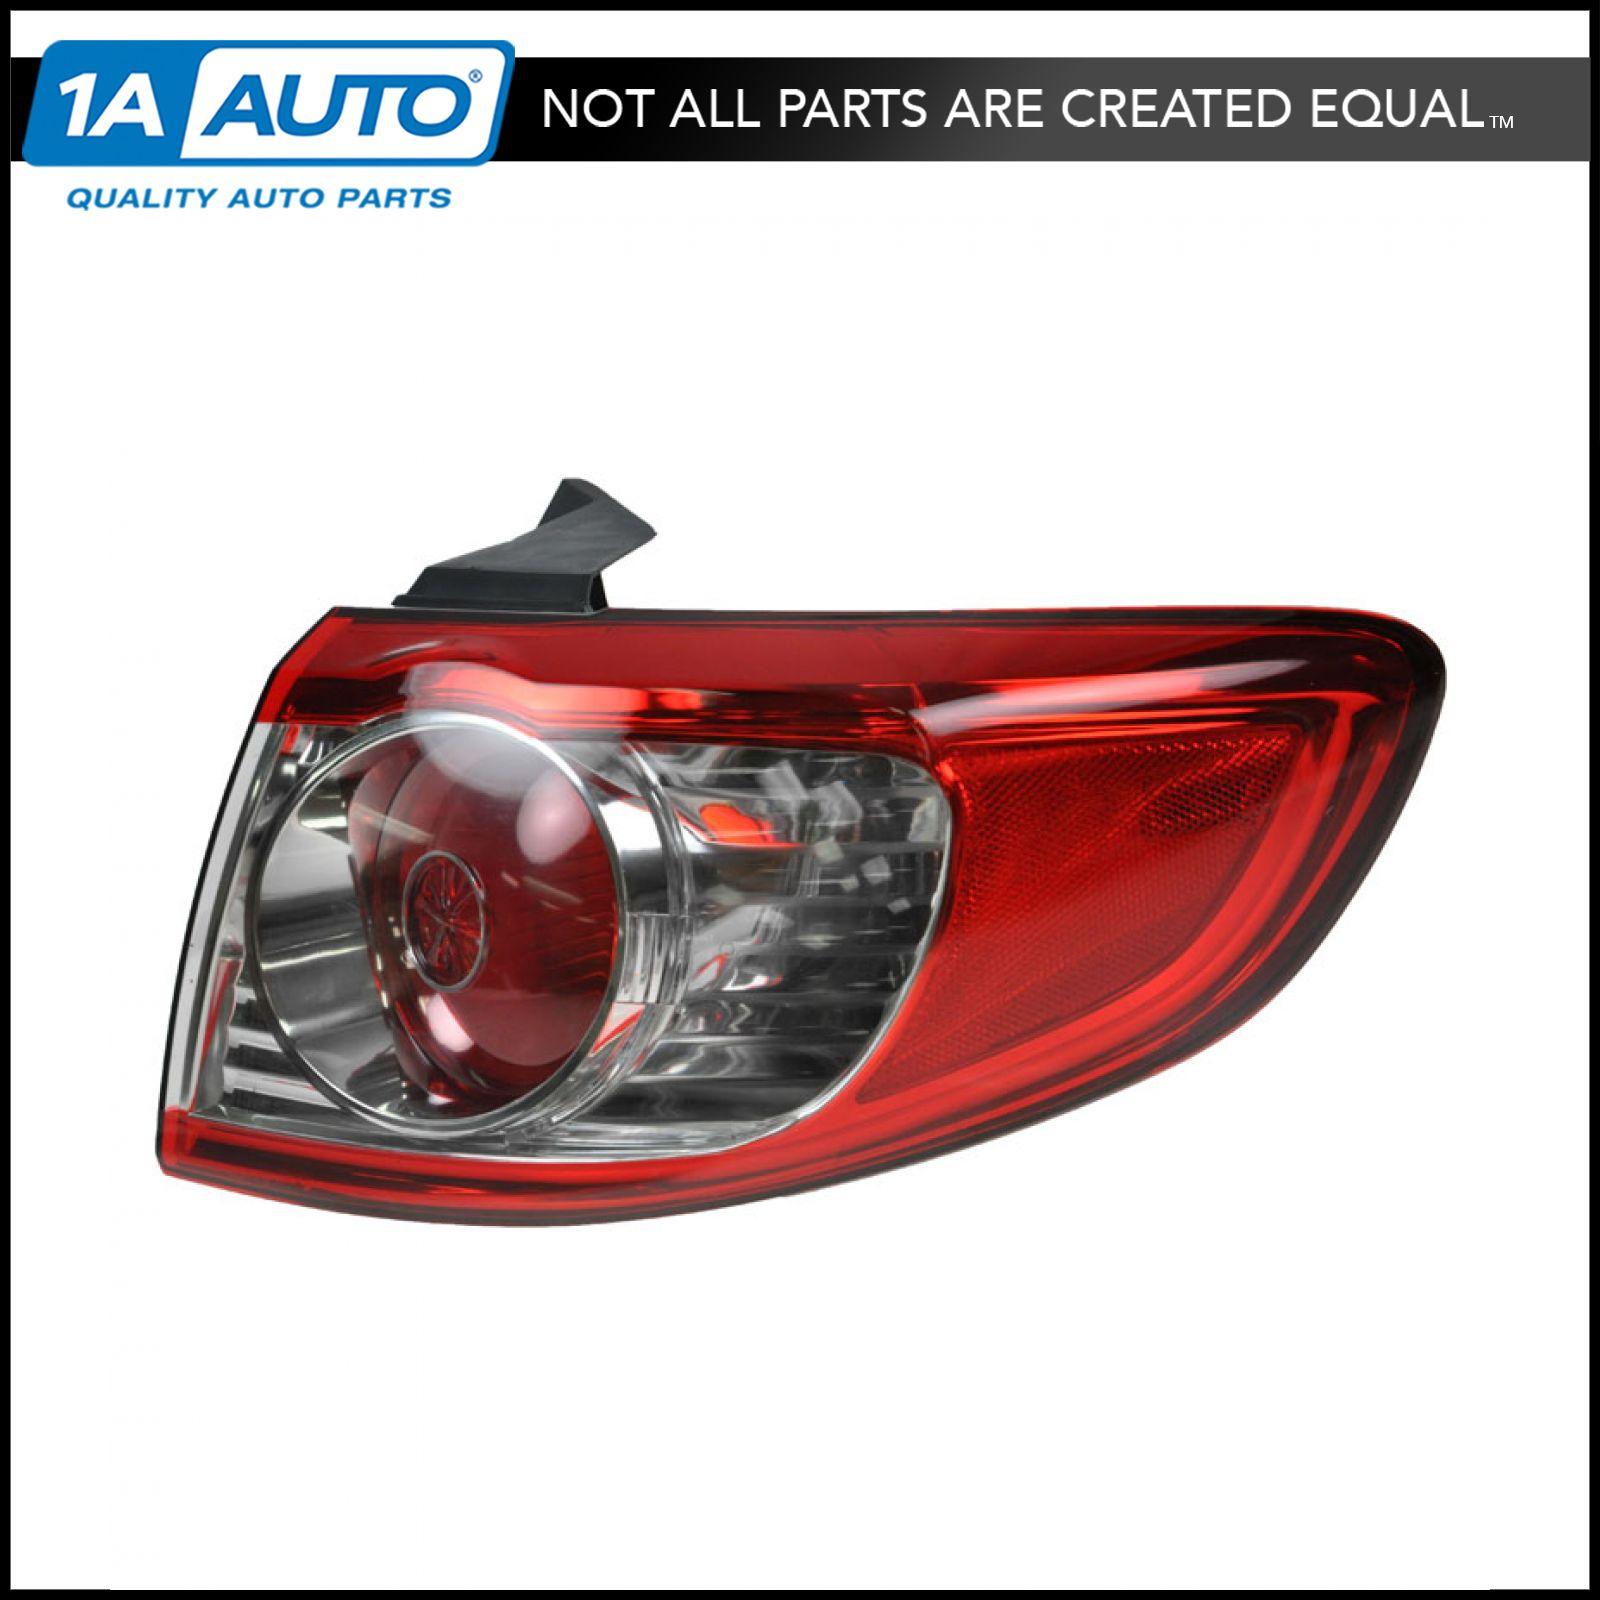 Tail Light Brake Lamp Assembly Rear Passenger Side Right RH Fits 11-12 Sonata